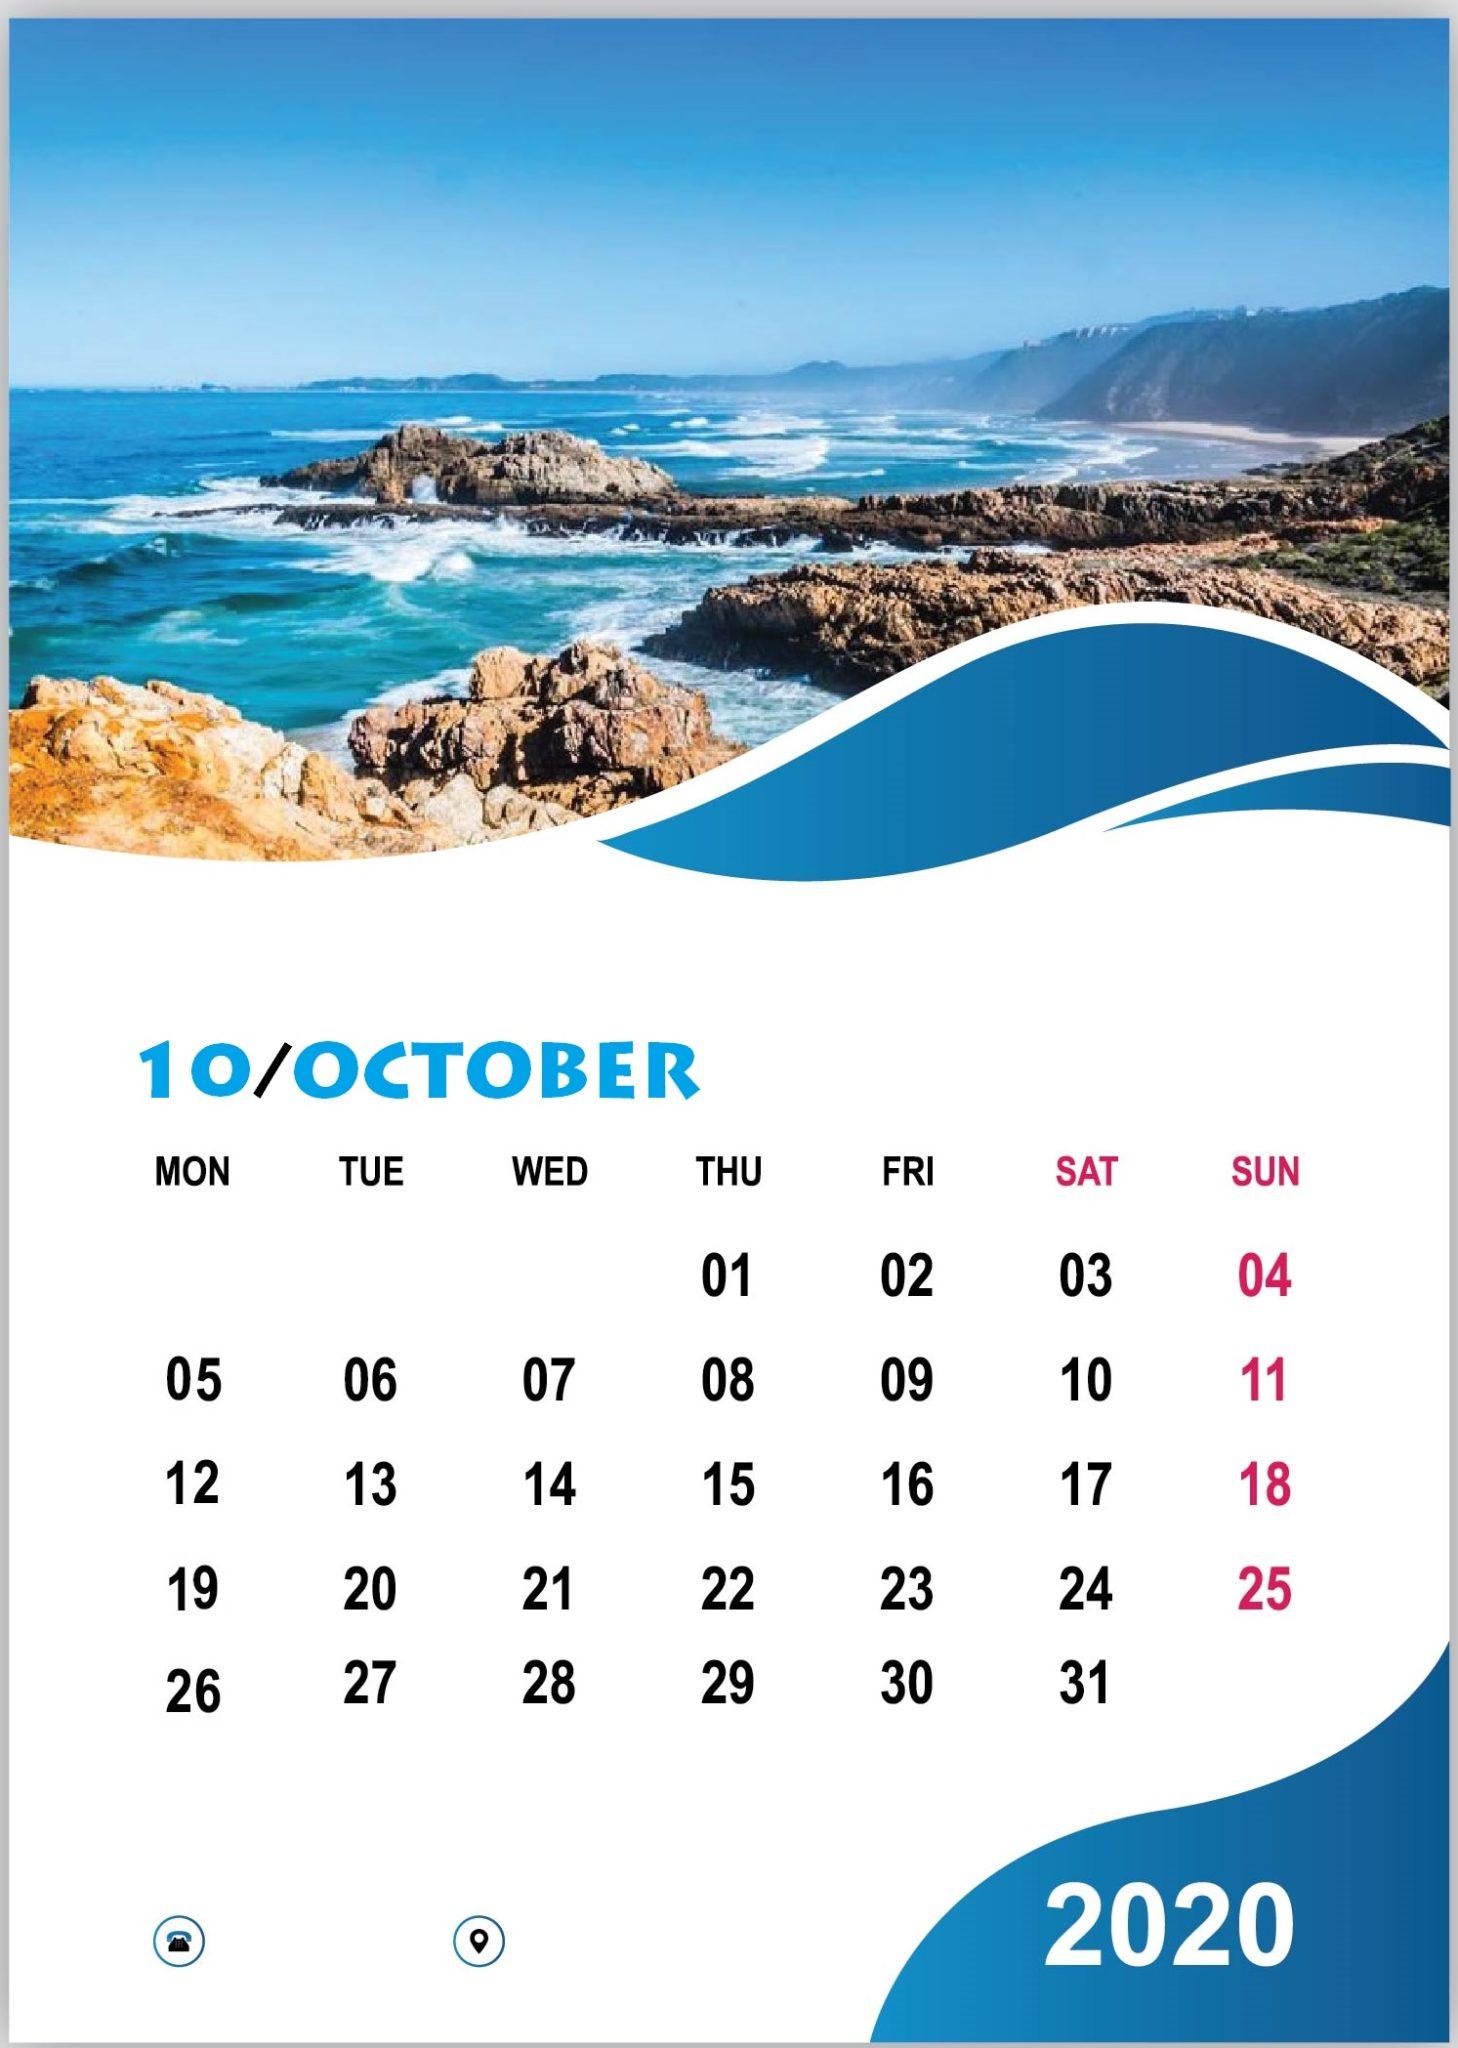 Free October 2020 Wall Calendar